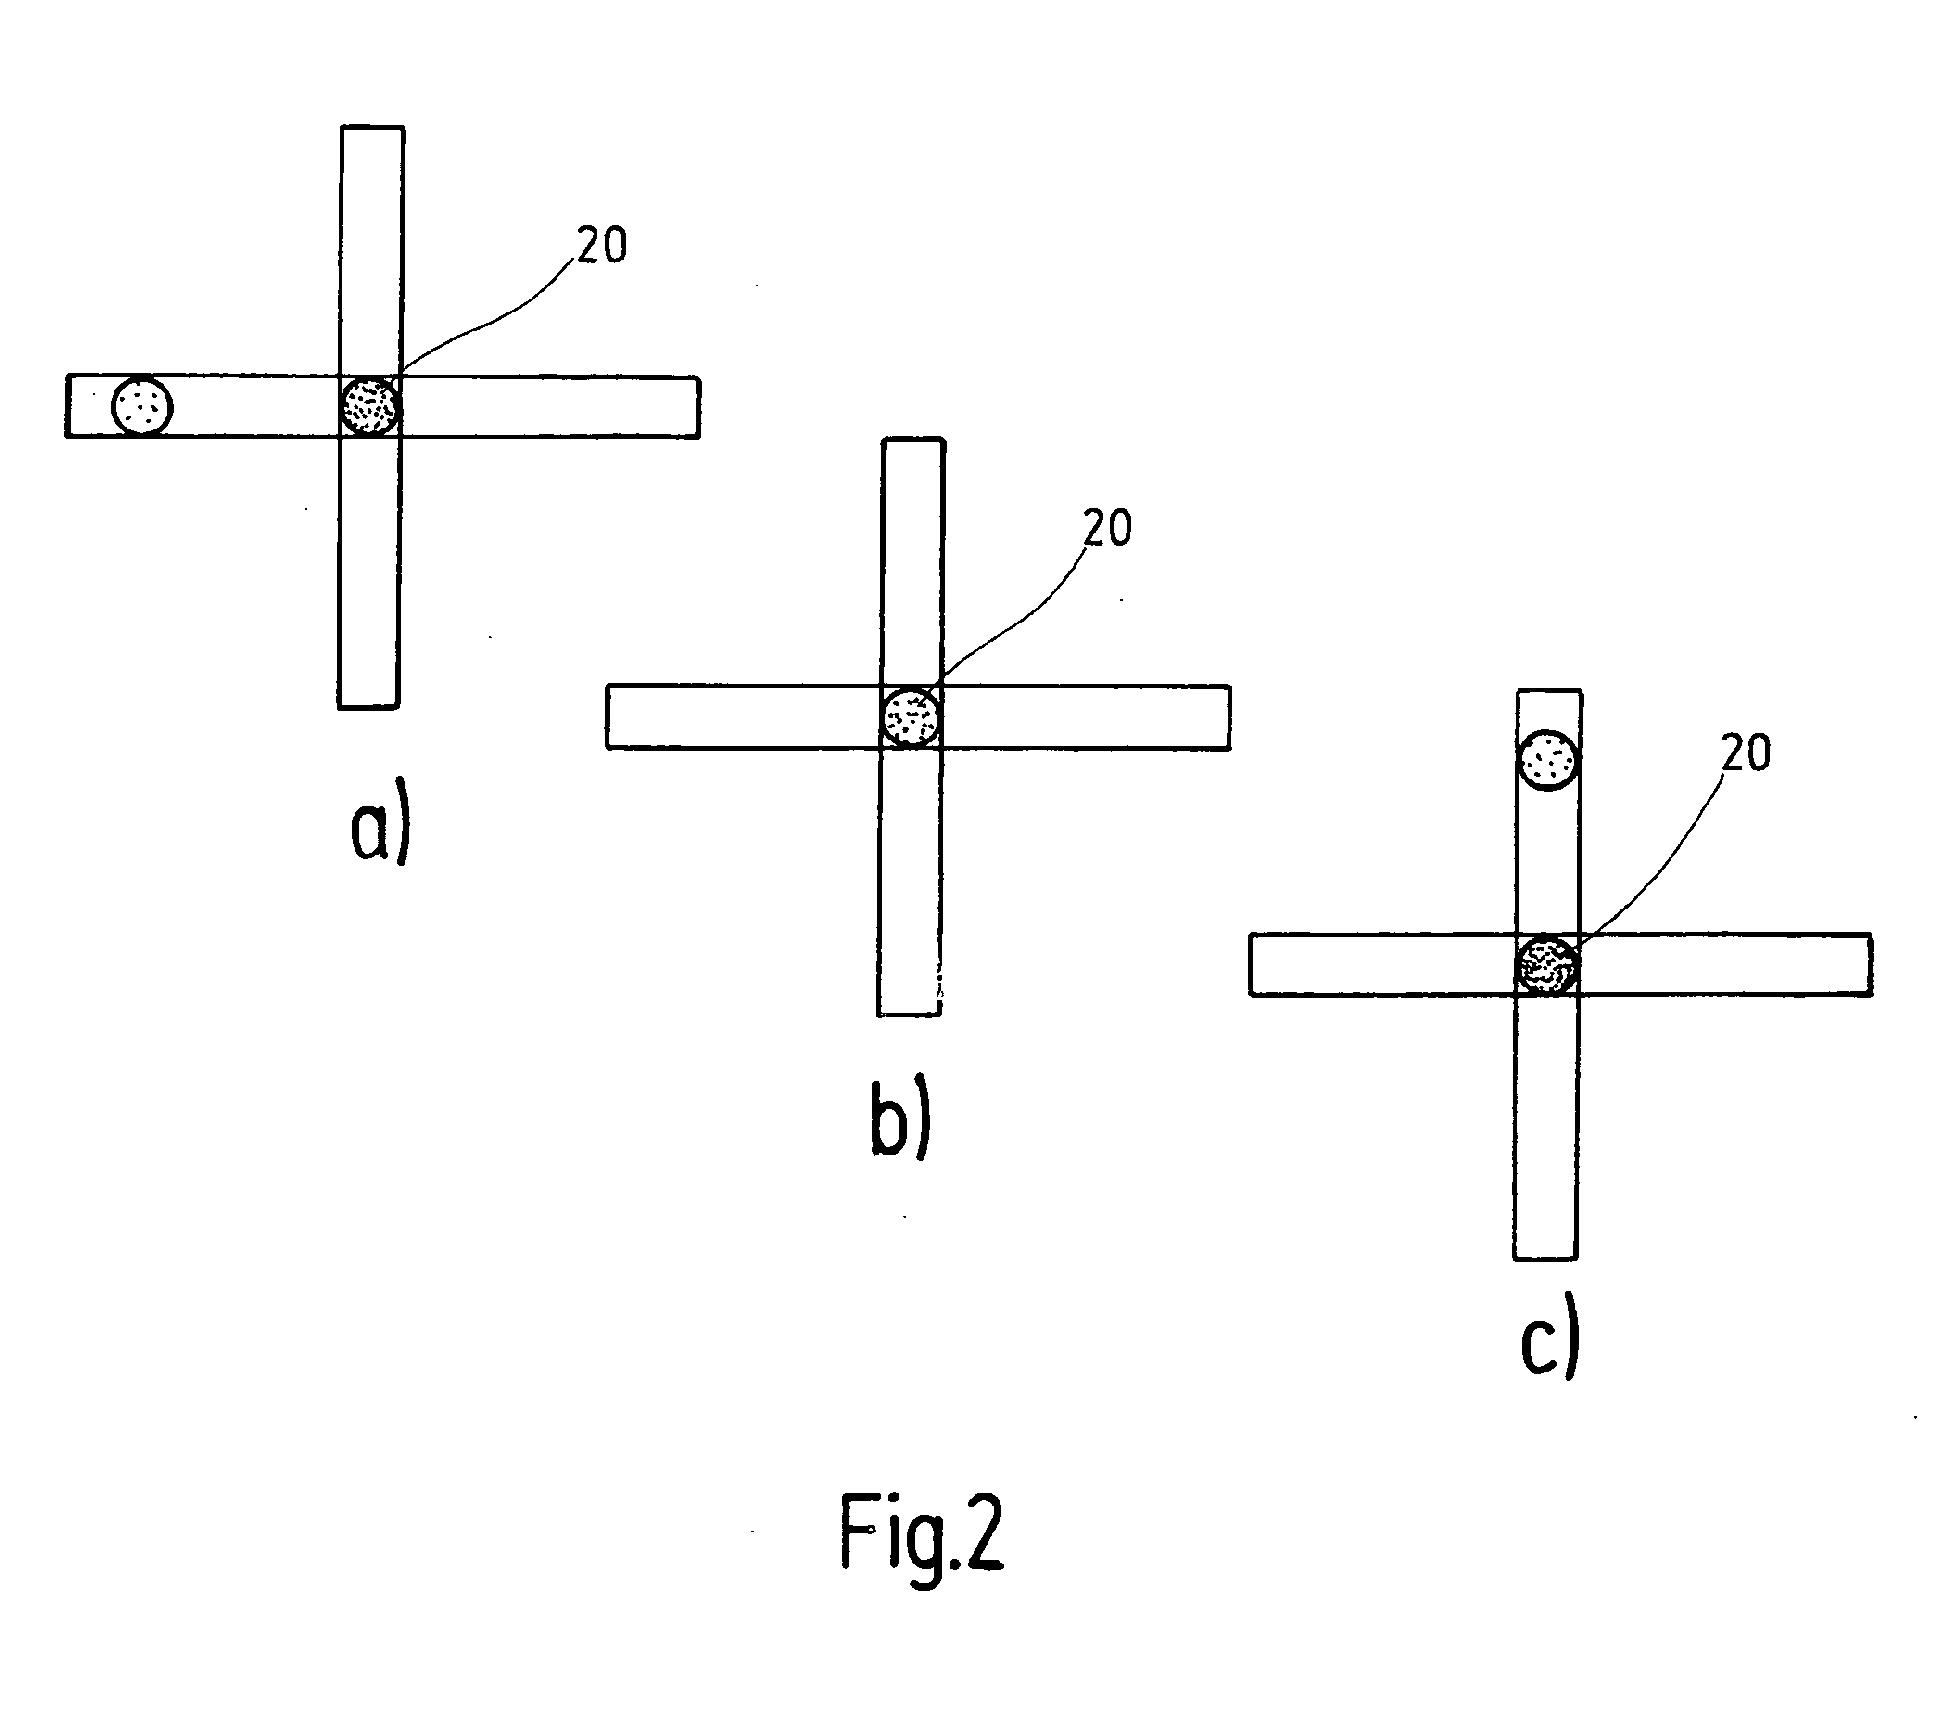 patent ep1553009b1 parkassistent zum parallel einparken. Black Bedroom Furniture Sets. Home Design Ideas